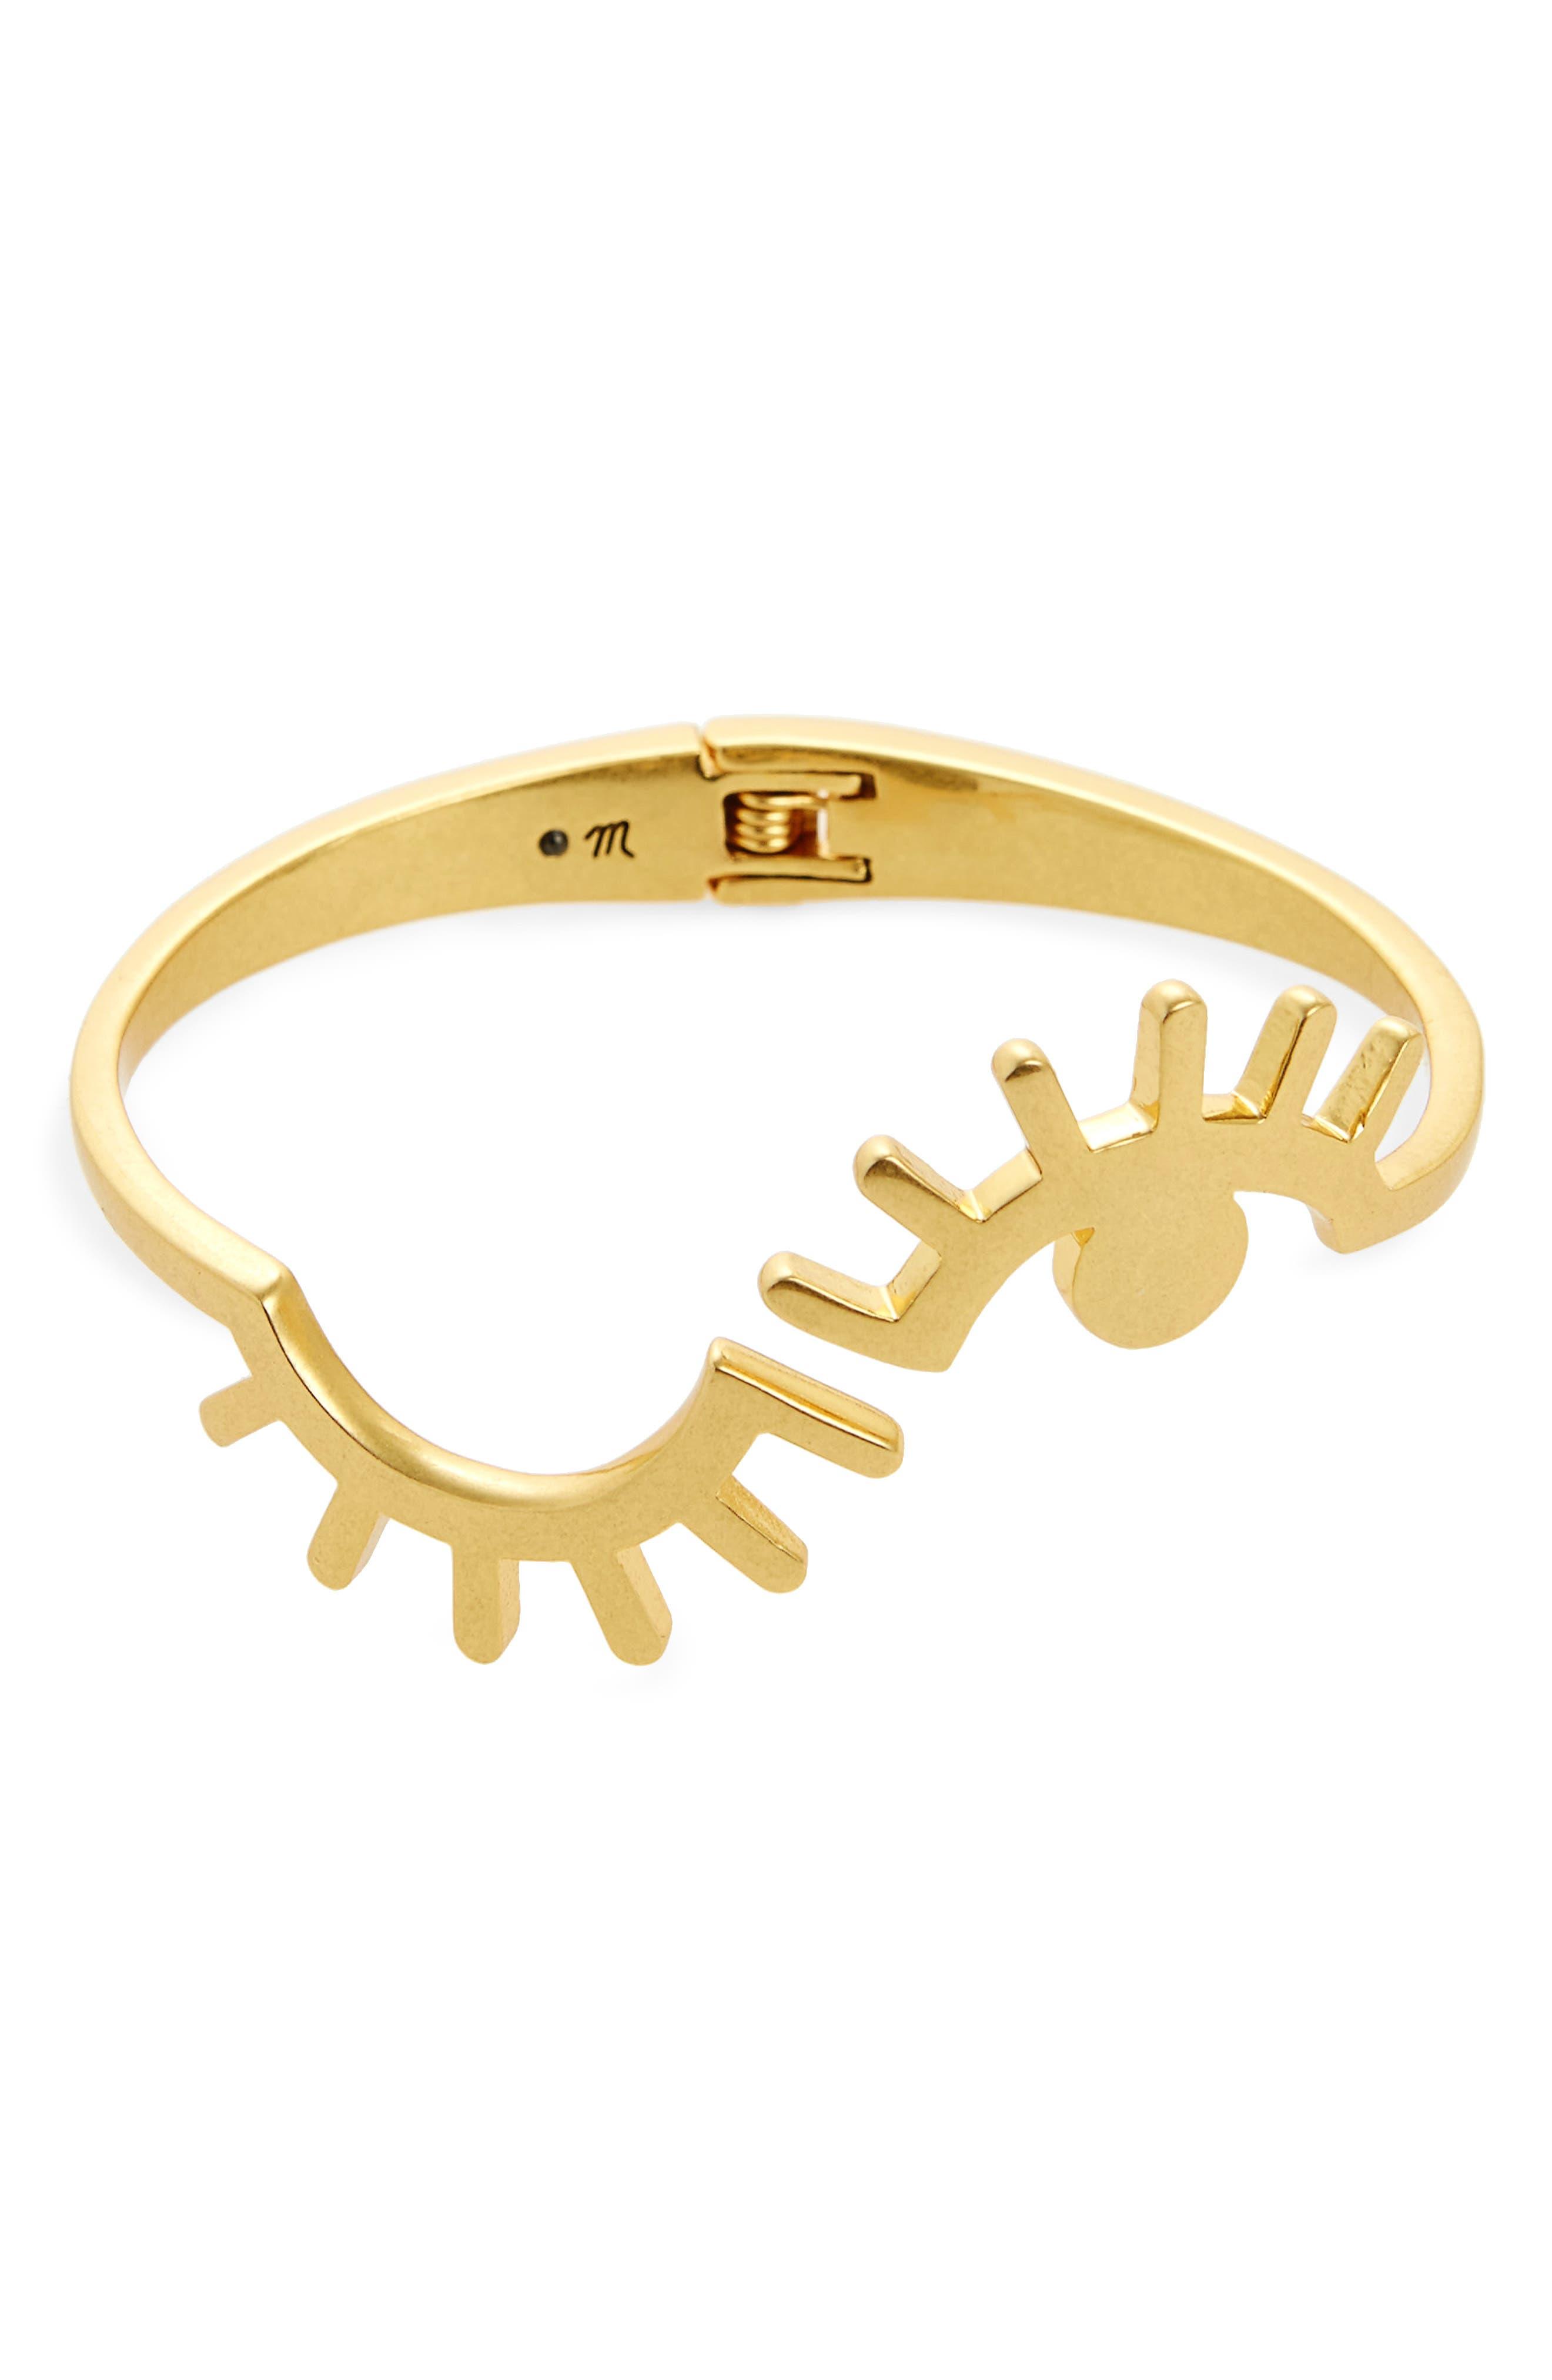 Looker Hinge Cuff Bracelet,                             Main thumbnail 1, color,